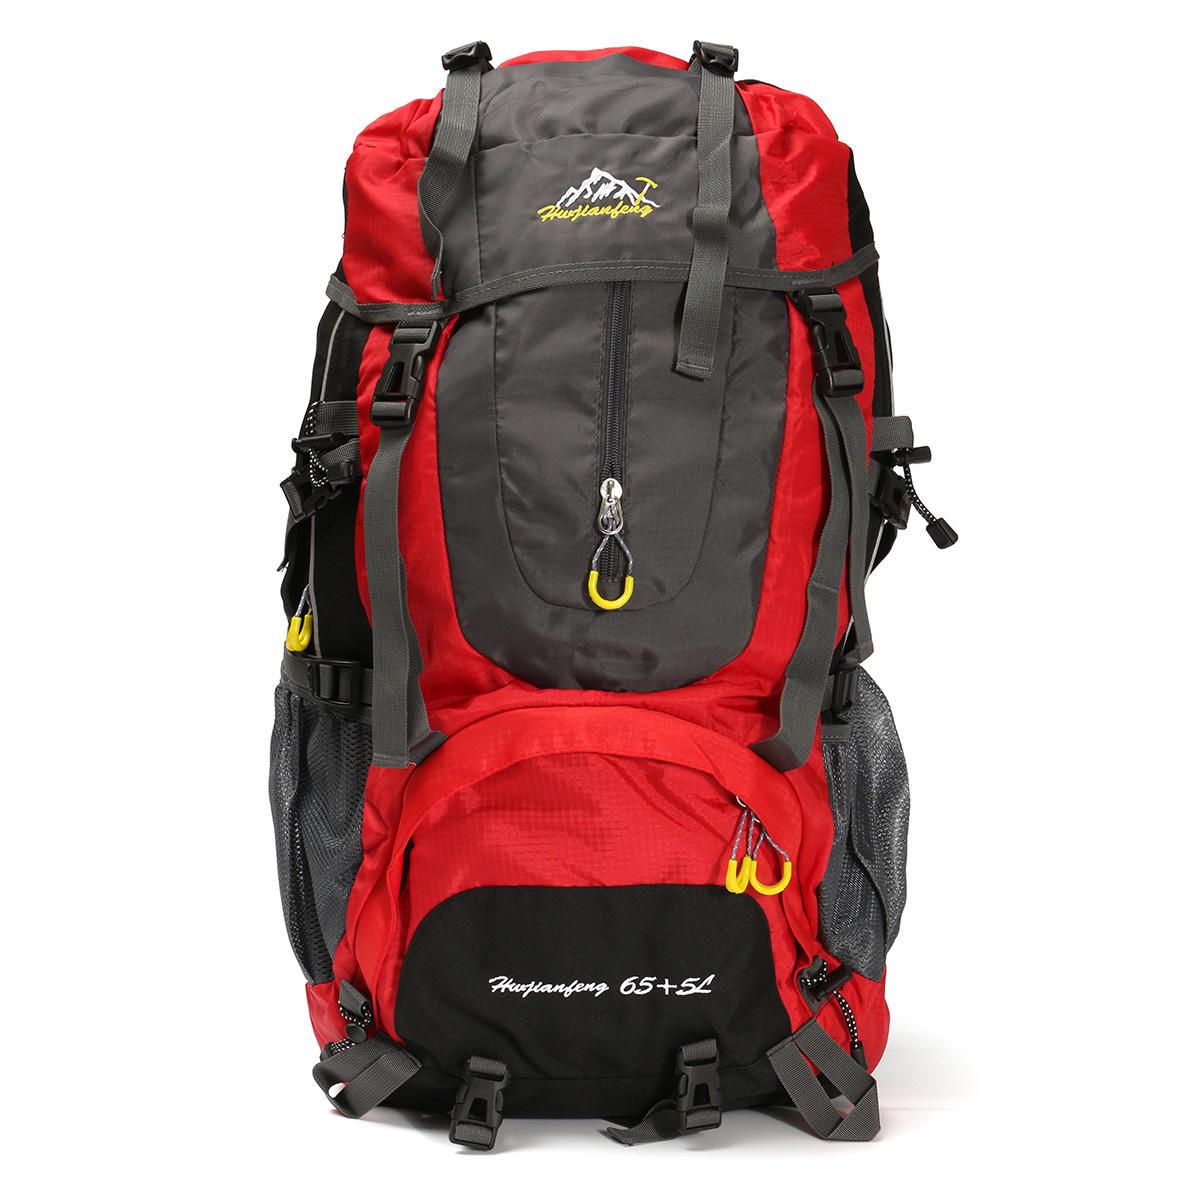 8e9142408df6 Outdoor 70L Waterproof Rucksack Backpack Camping Hiking Trekking Travel  Shoulder Bag Pack